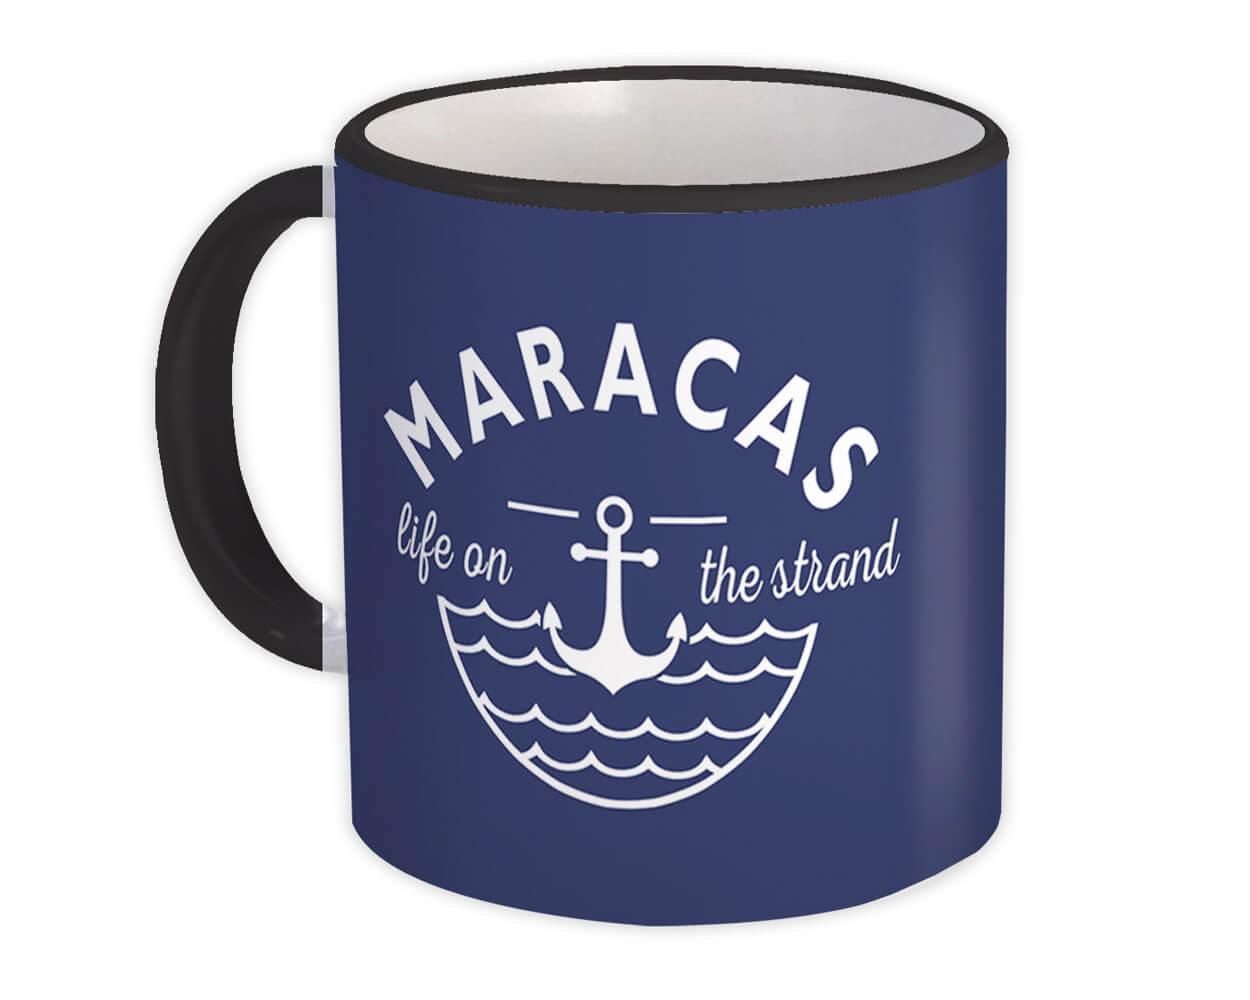 Maracas Life on the Strand : Gift Mug Beach Travel Souvenir Trinidad & Tobago